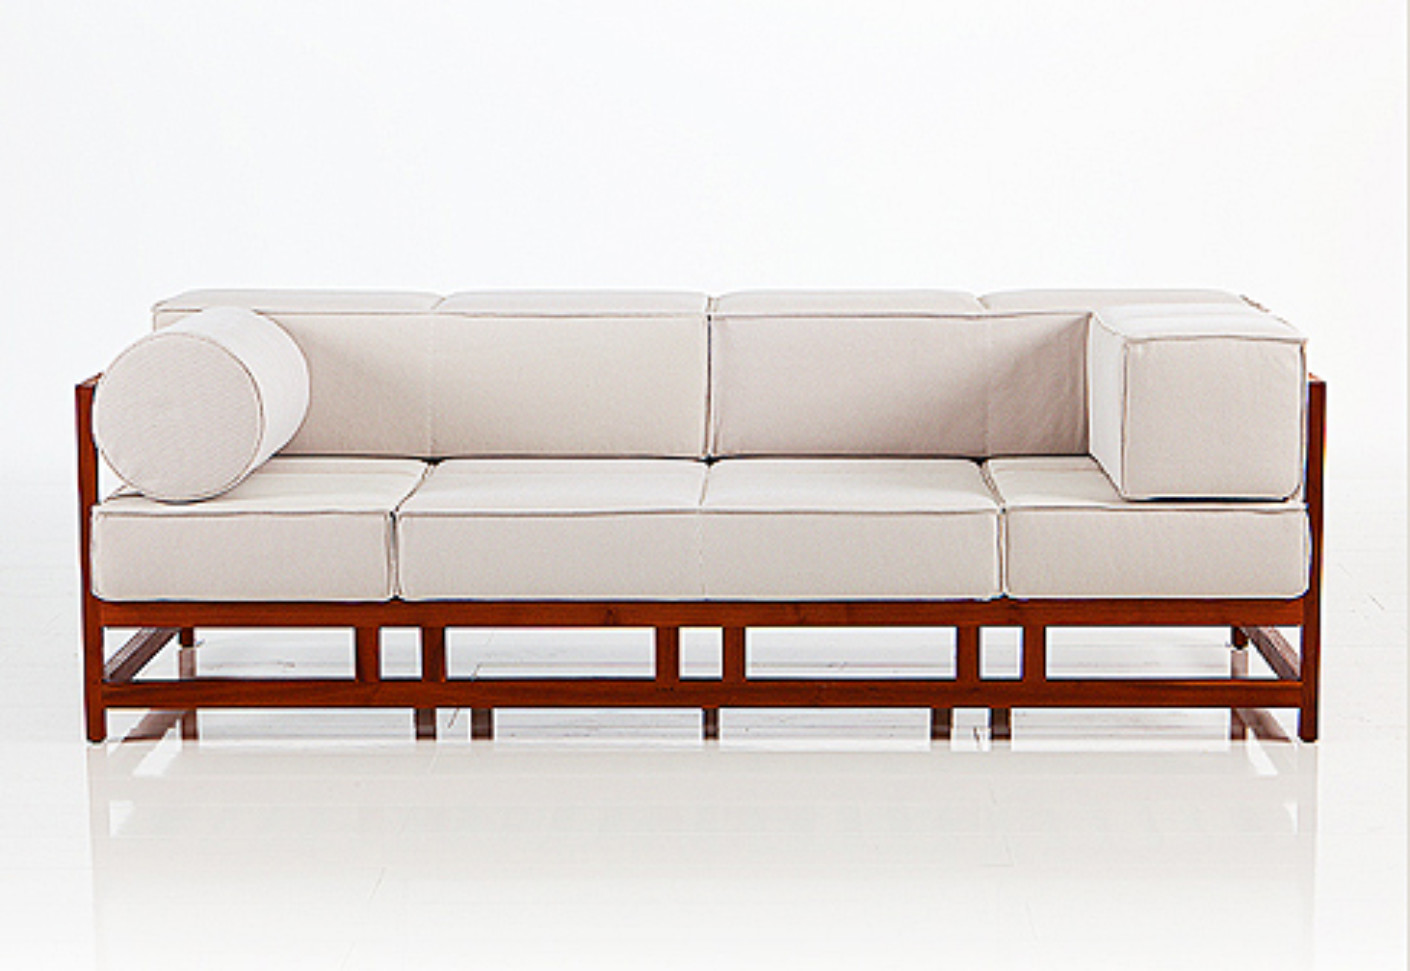 Easy Pieces Lodge sofa by Brühl